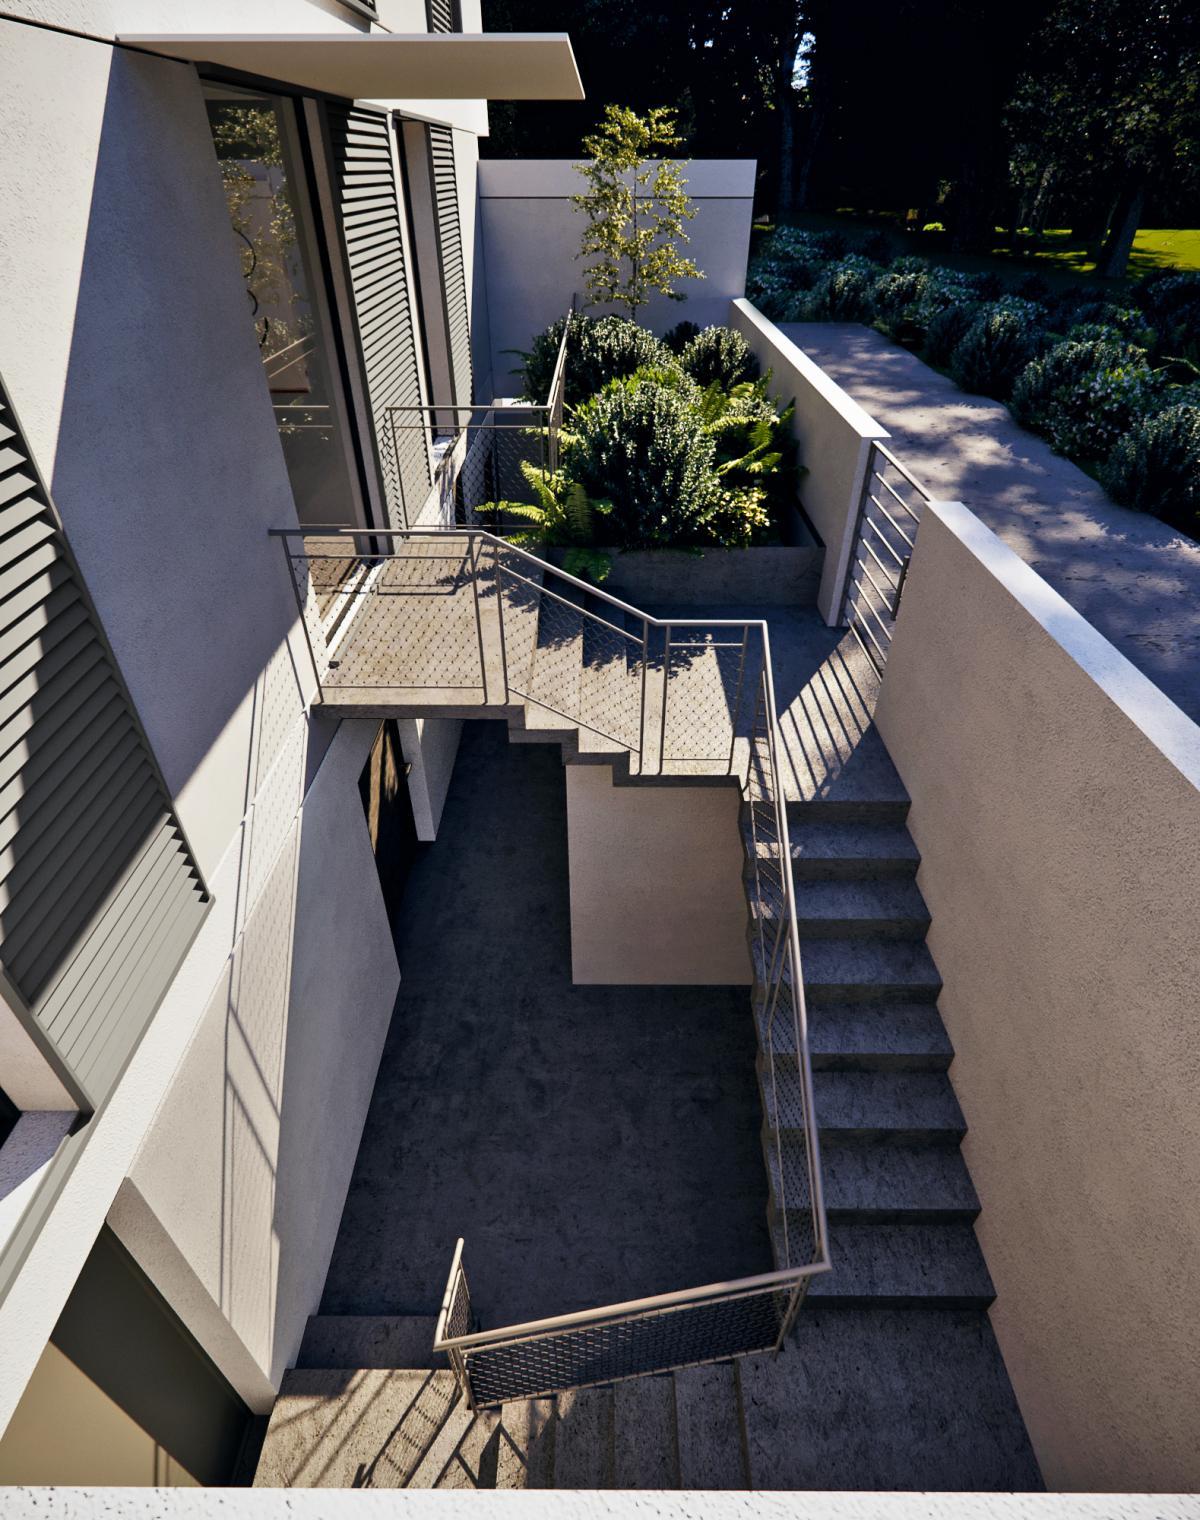 3d photography of a villa staircase